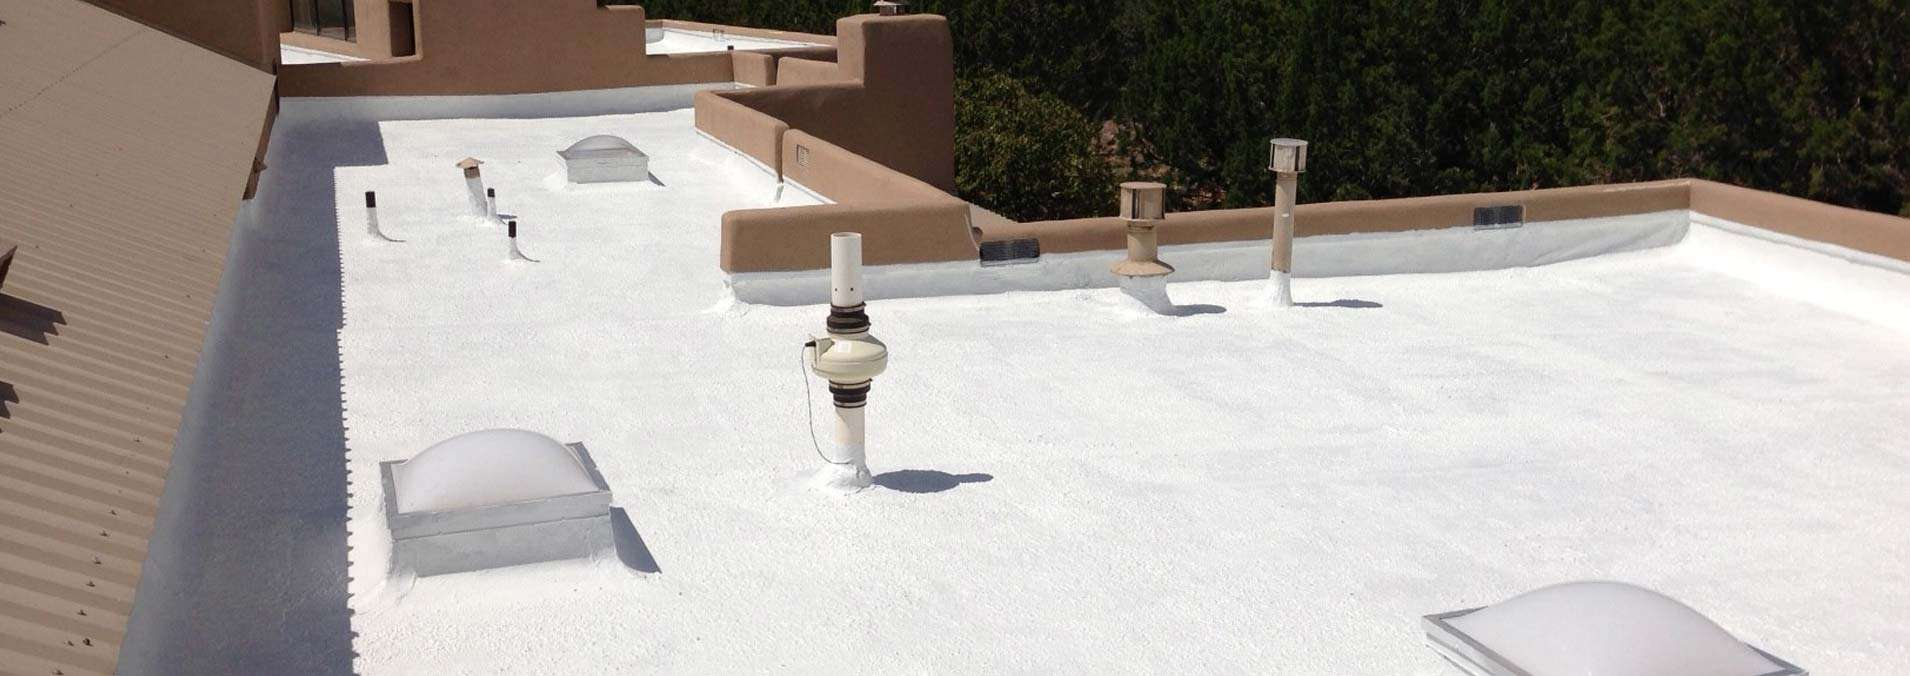 Flat Roof Coatings Atlanta, GA